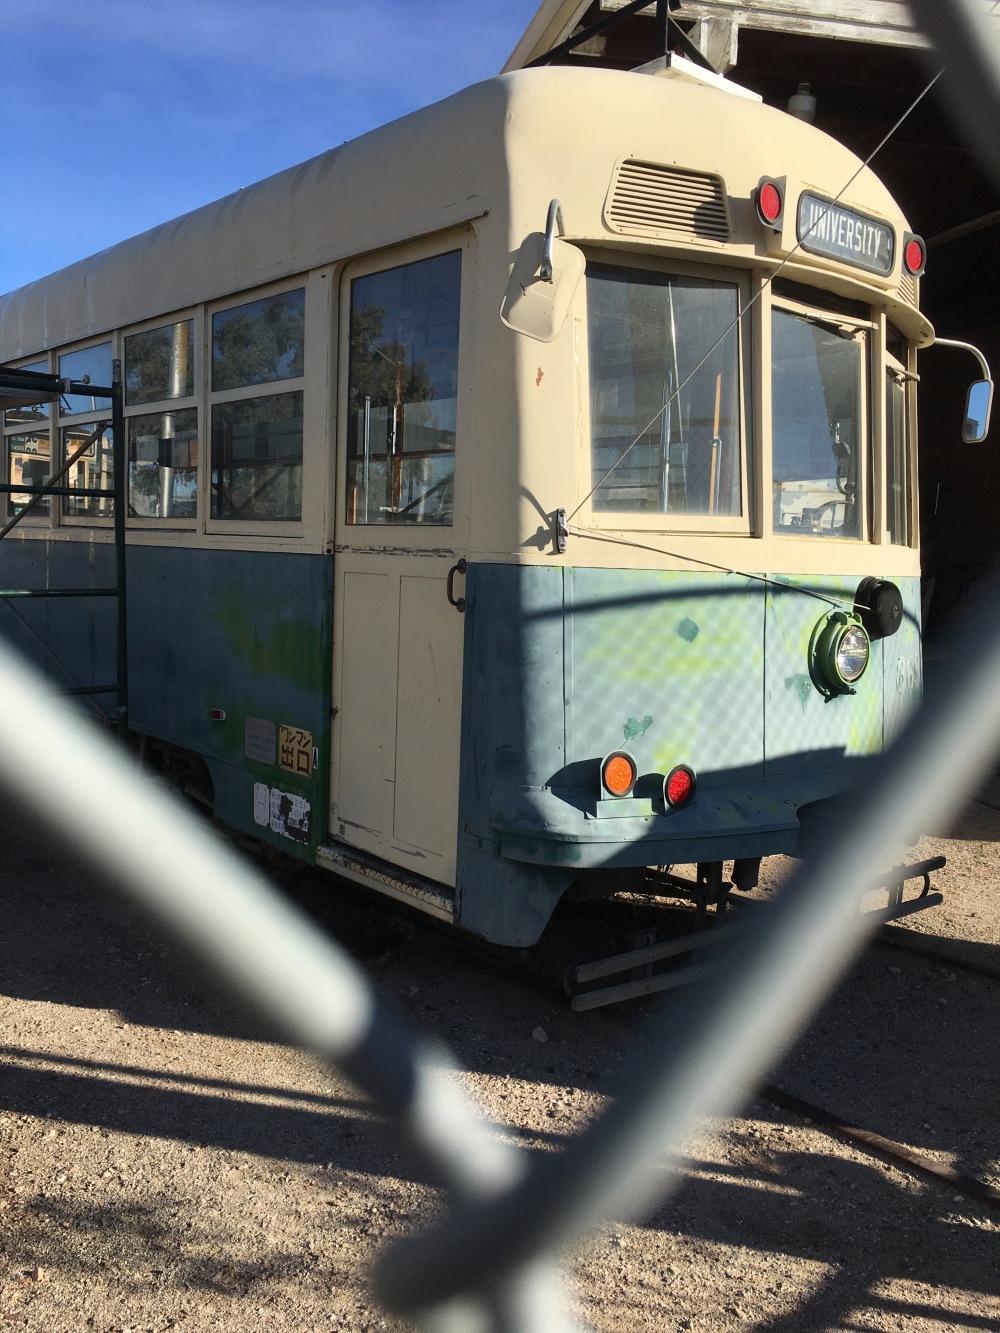 Trolley Car Museum, Tucson, Arizona